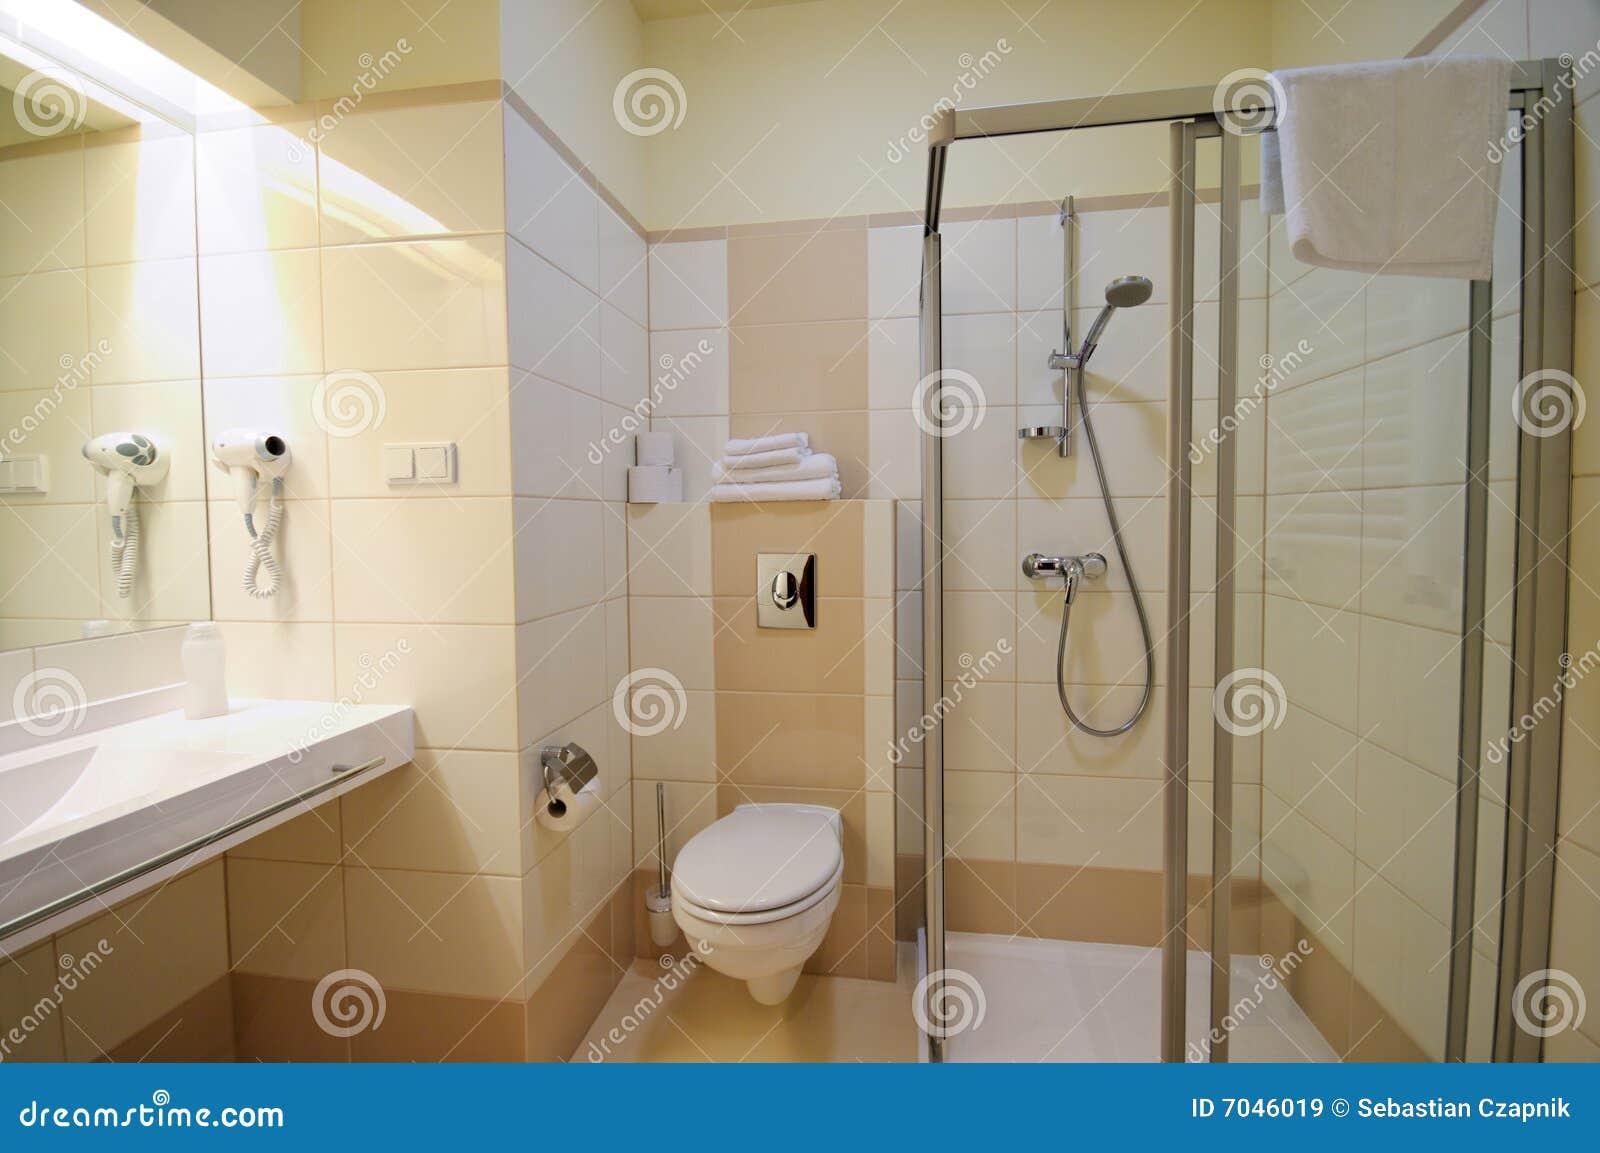 Beige bathroom stock image image of sing tiling beige - Badezimmer beige ...